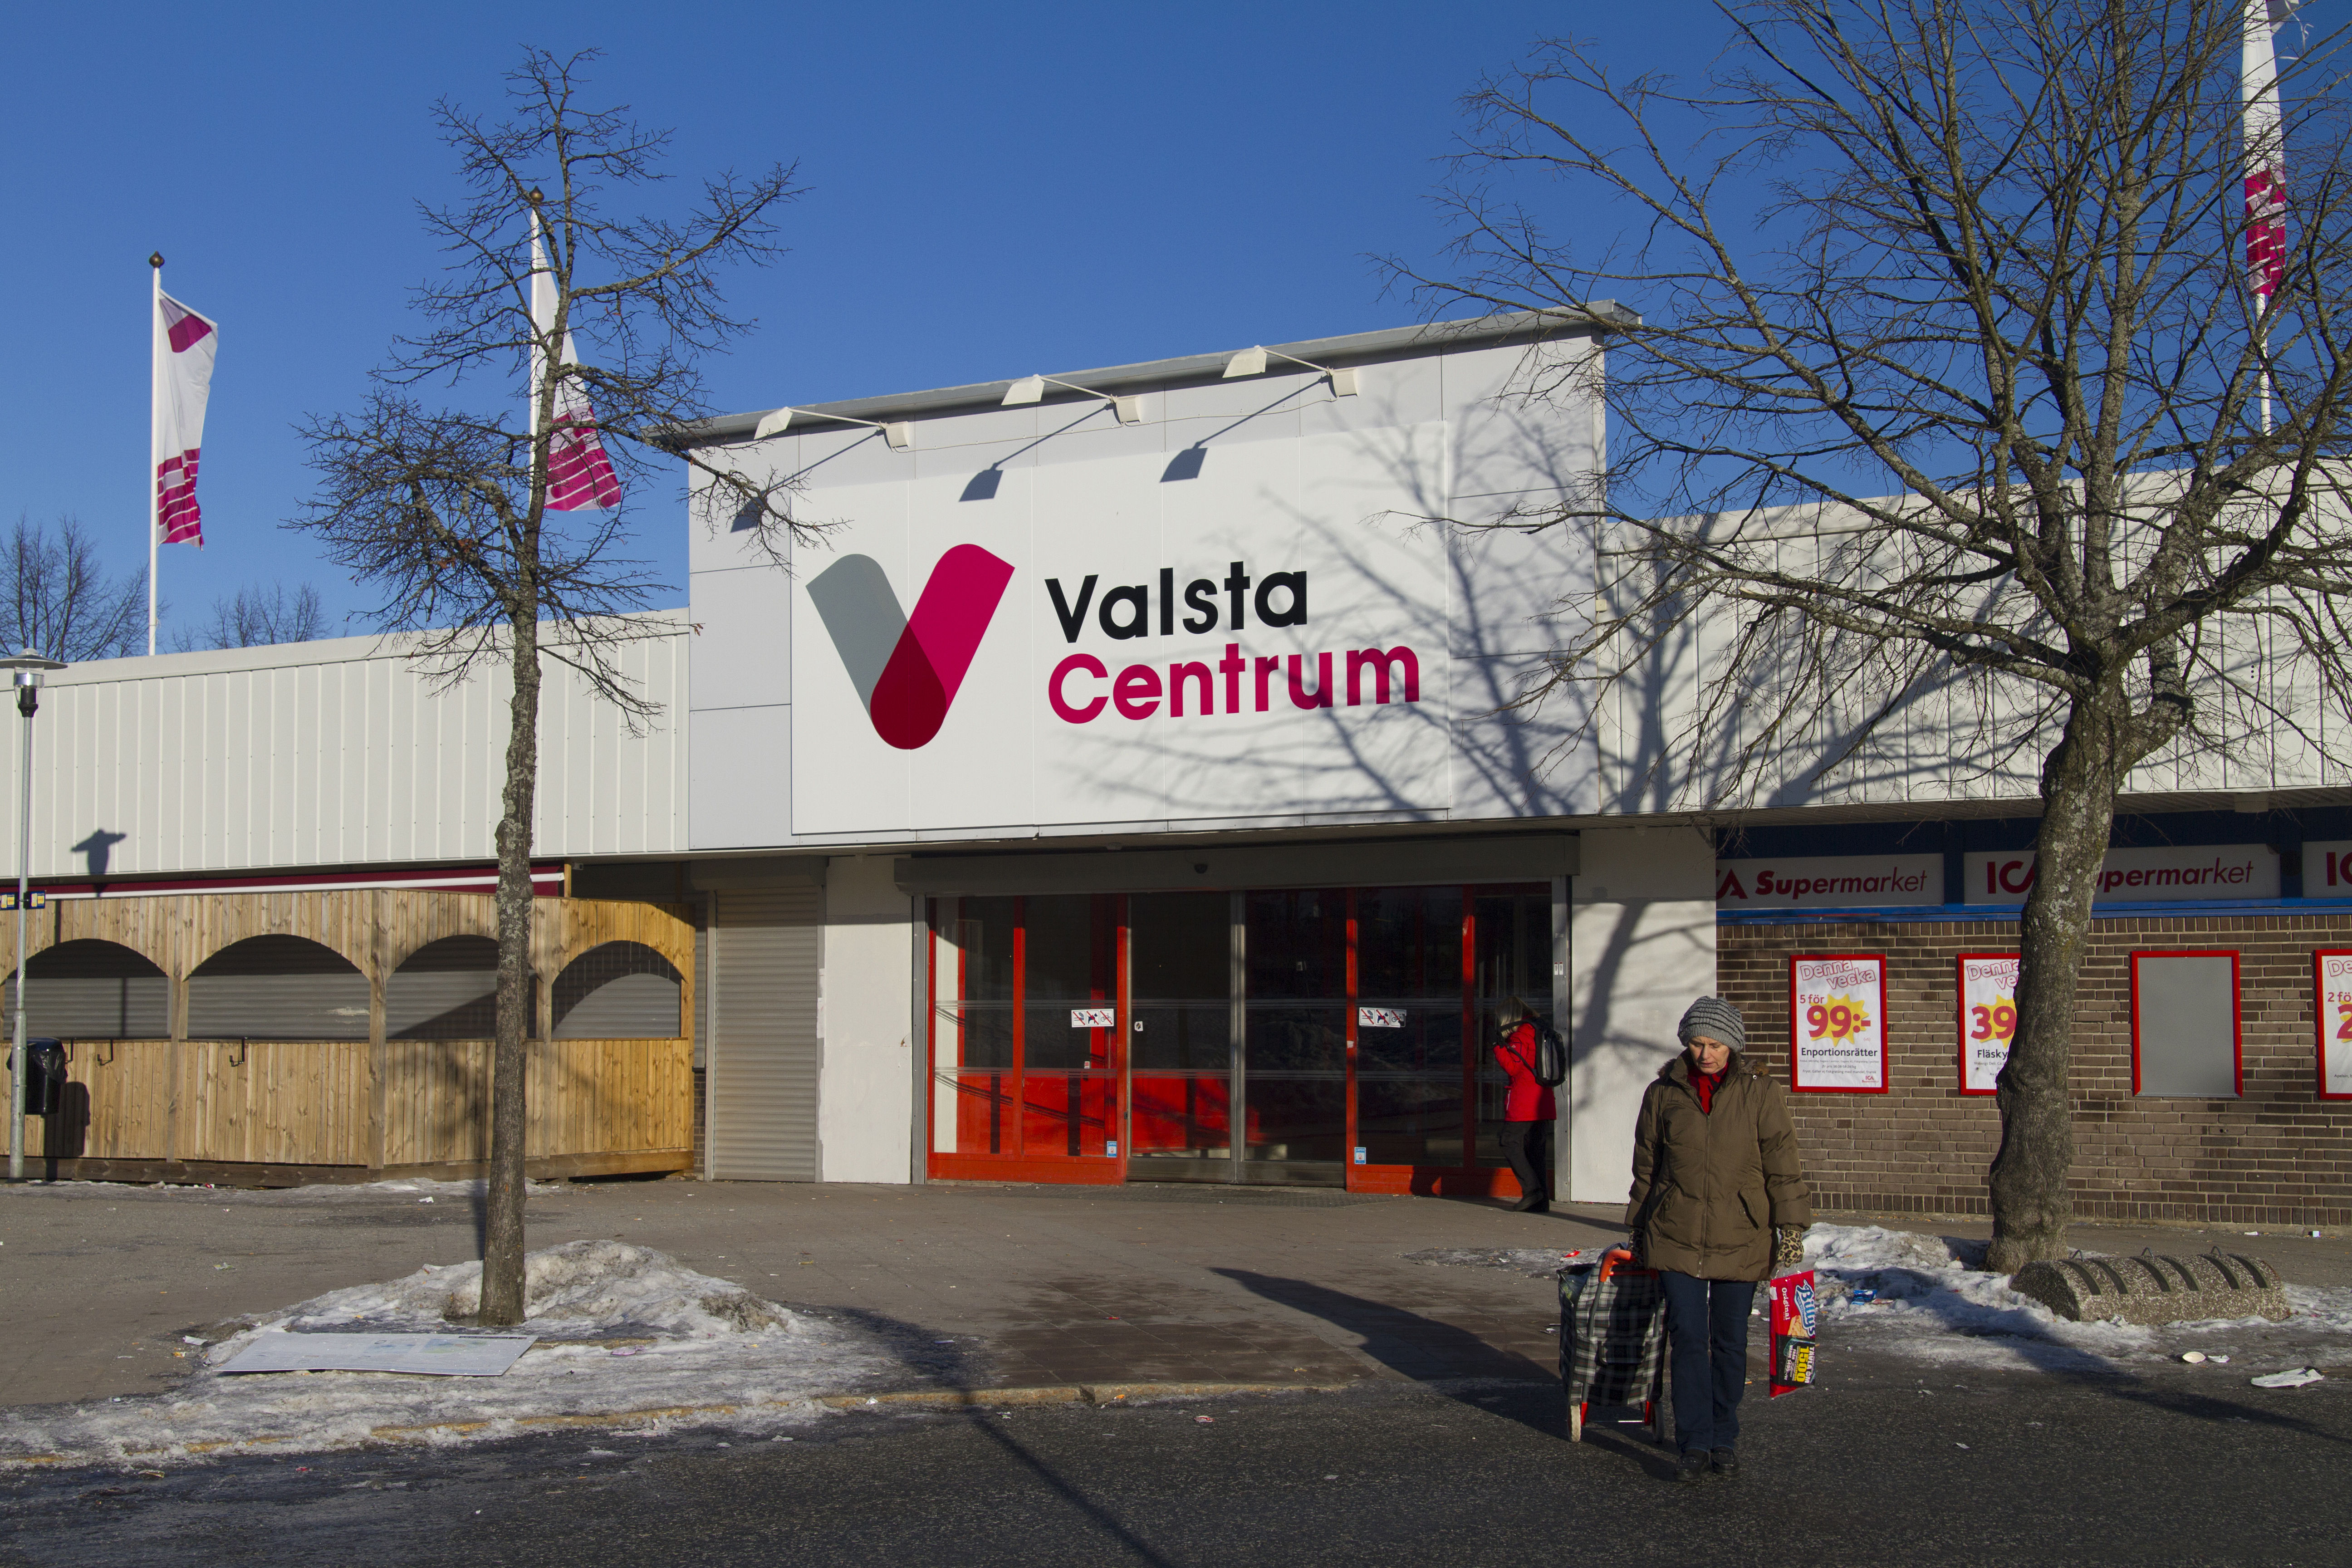 Dating site tips Valsta